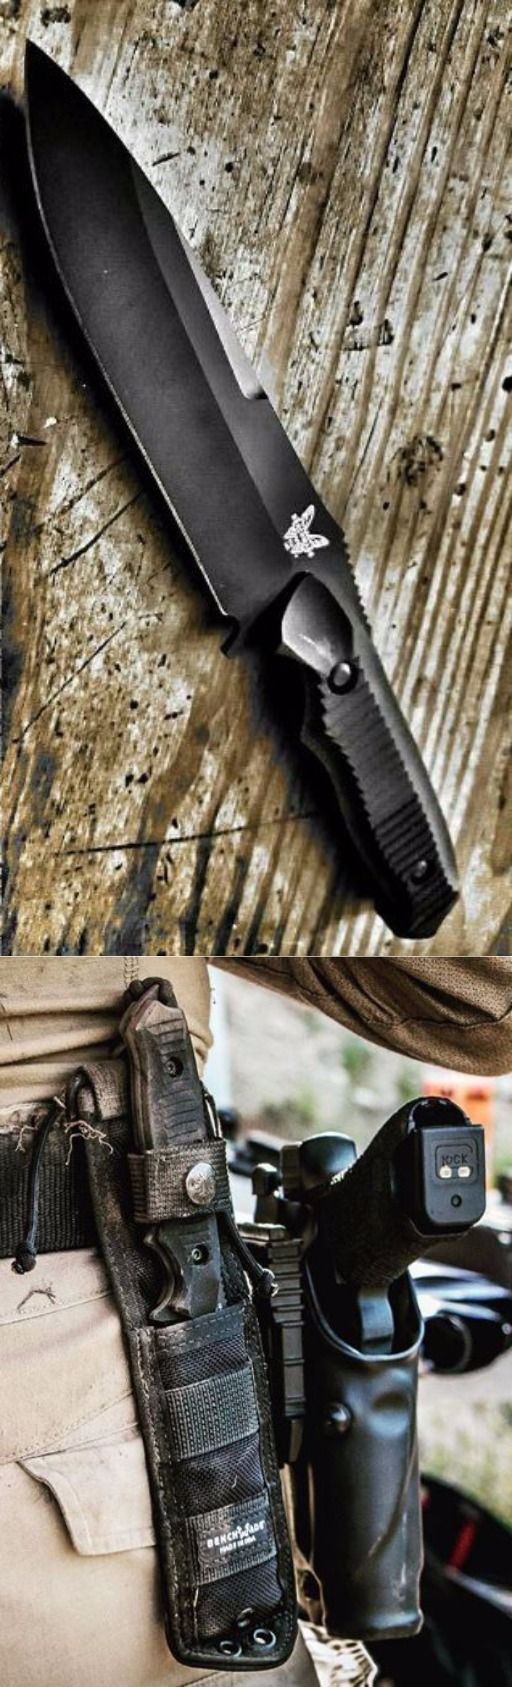 Benchmade – Nimravus 140, Drop-Point Fixed Knife @thistookmymoney